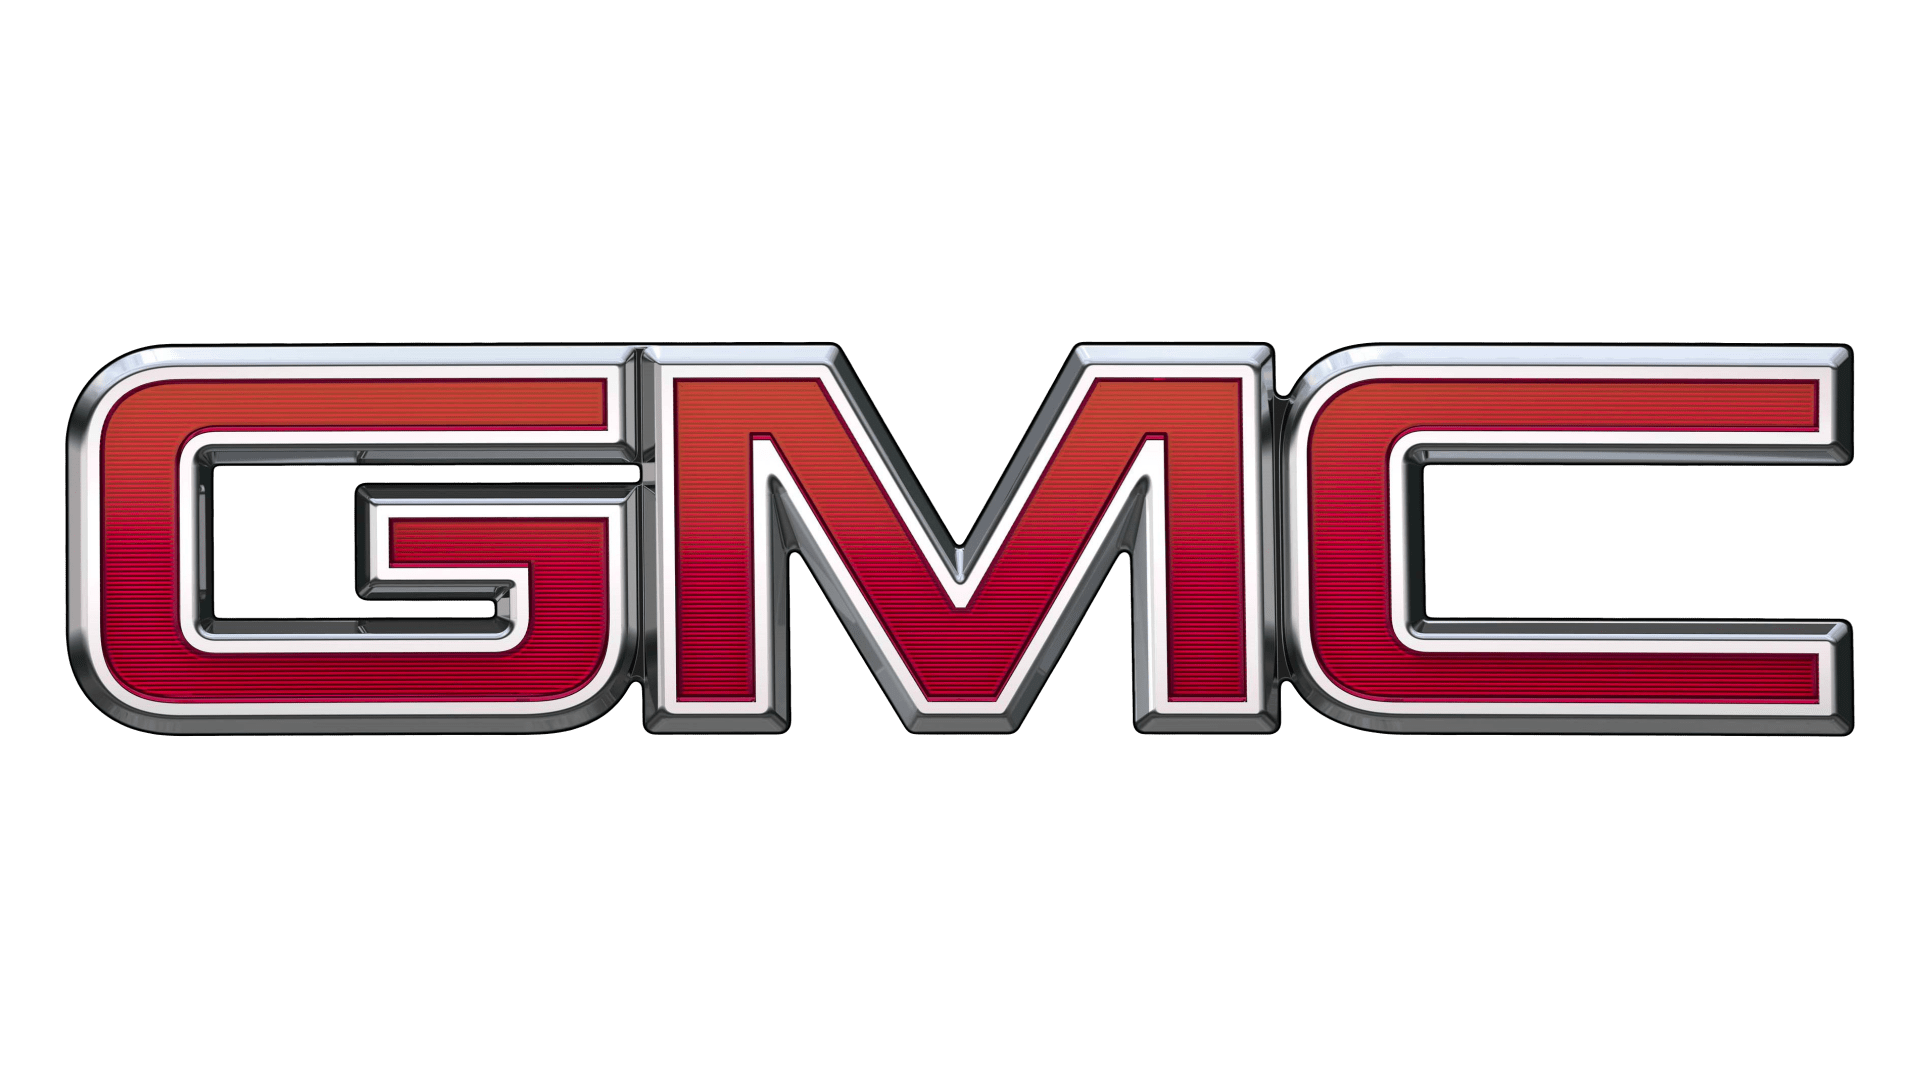 Логотип GMC (General Motors Company)